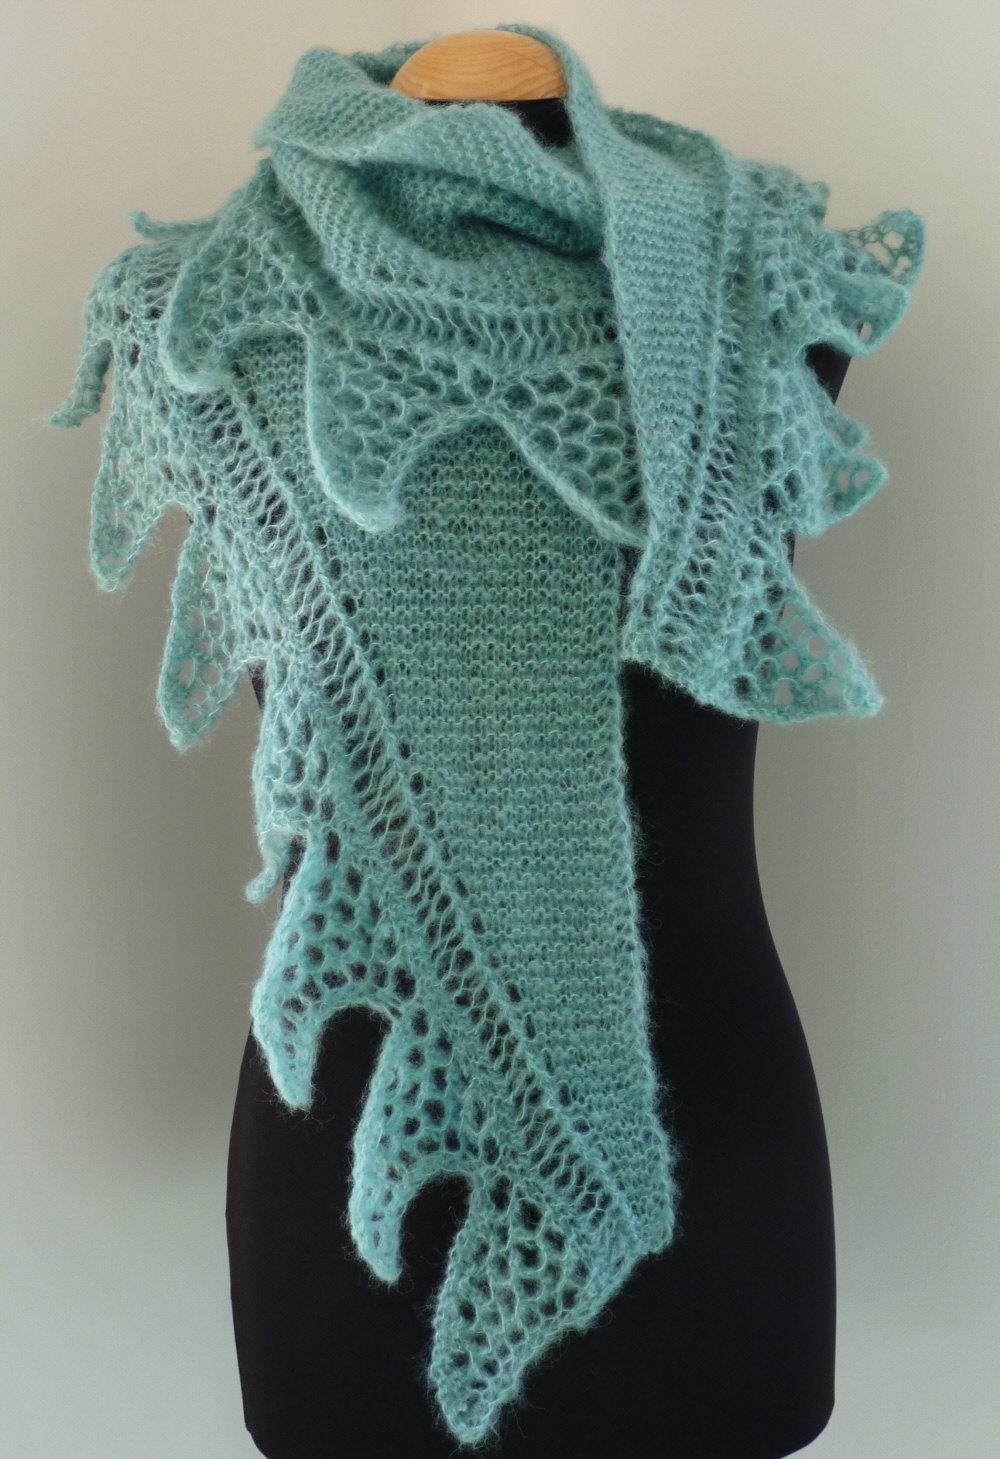 Shark Knitting Patterns In the Loop Knitting